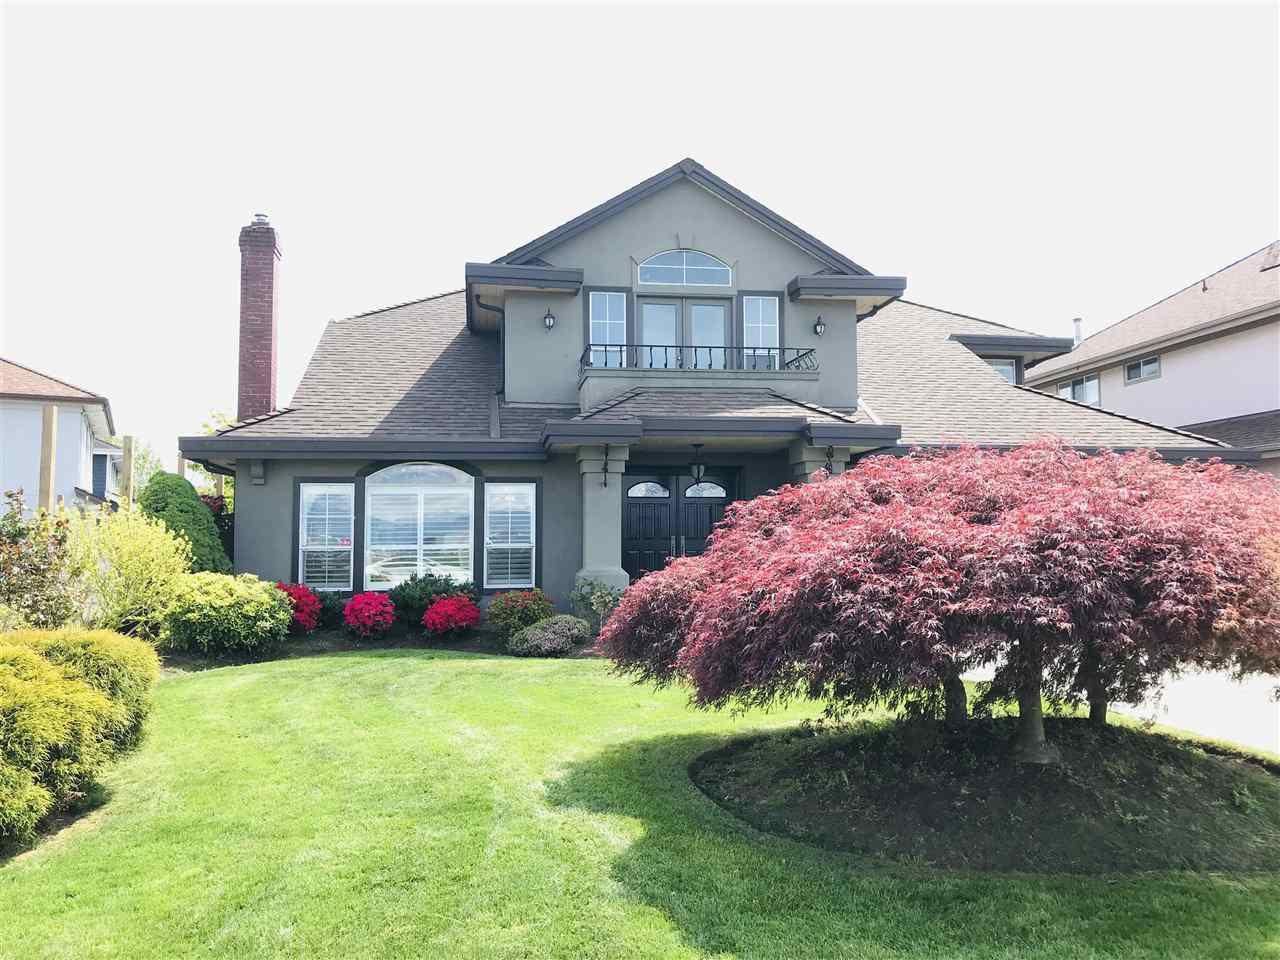 Main Photo: 3620 RIVER Road in Richmond: Terra Nova House for sale : MLS®# R2330733